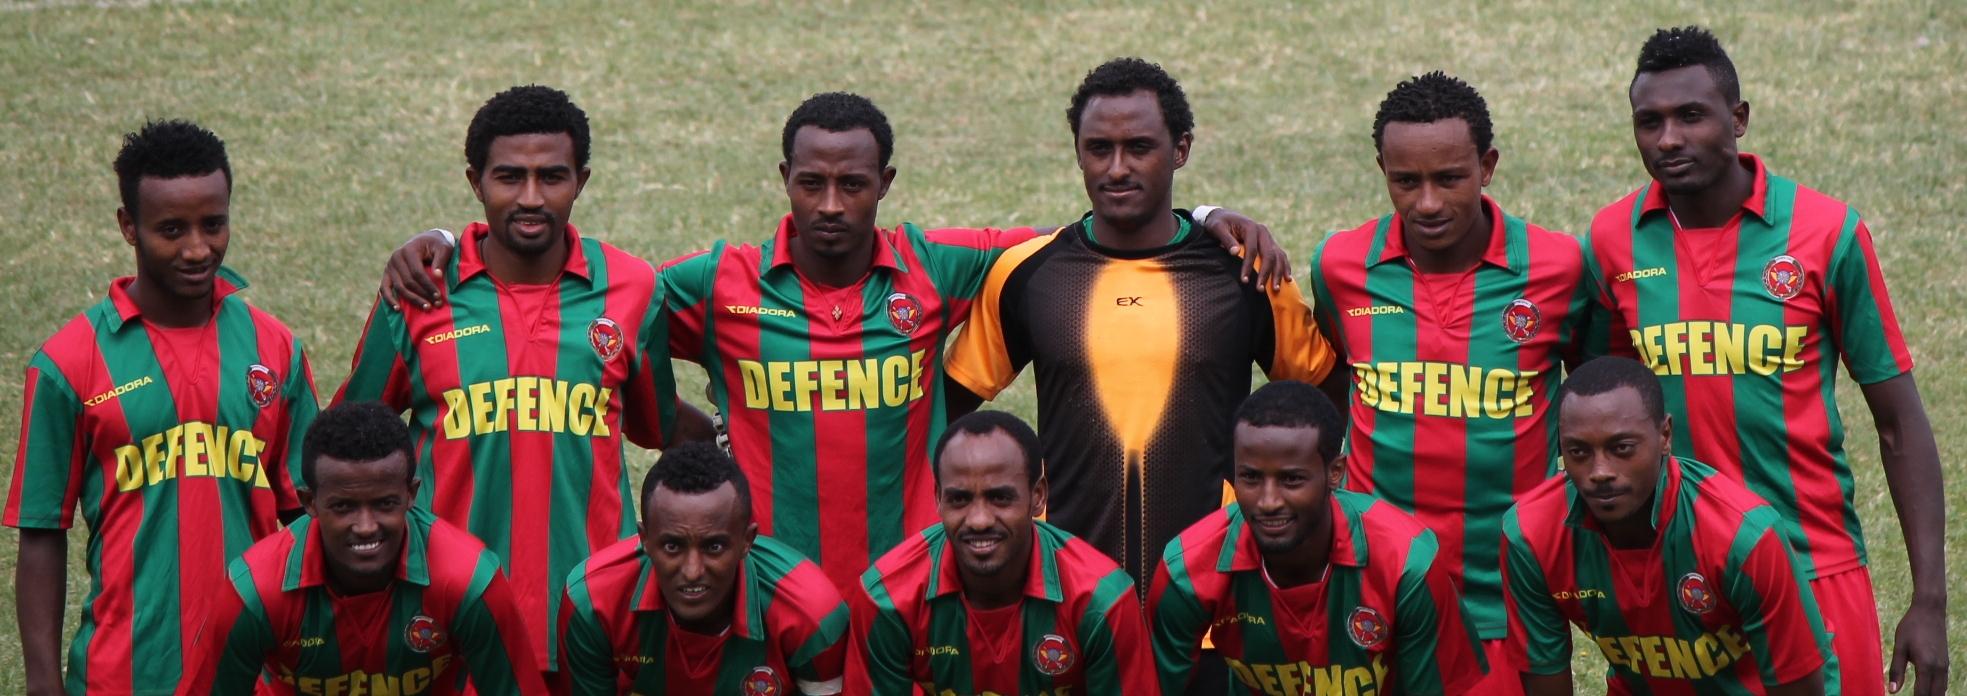 Defence 2007